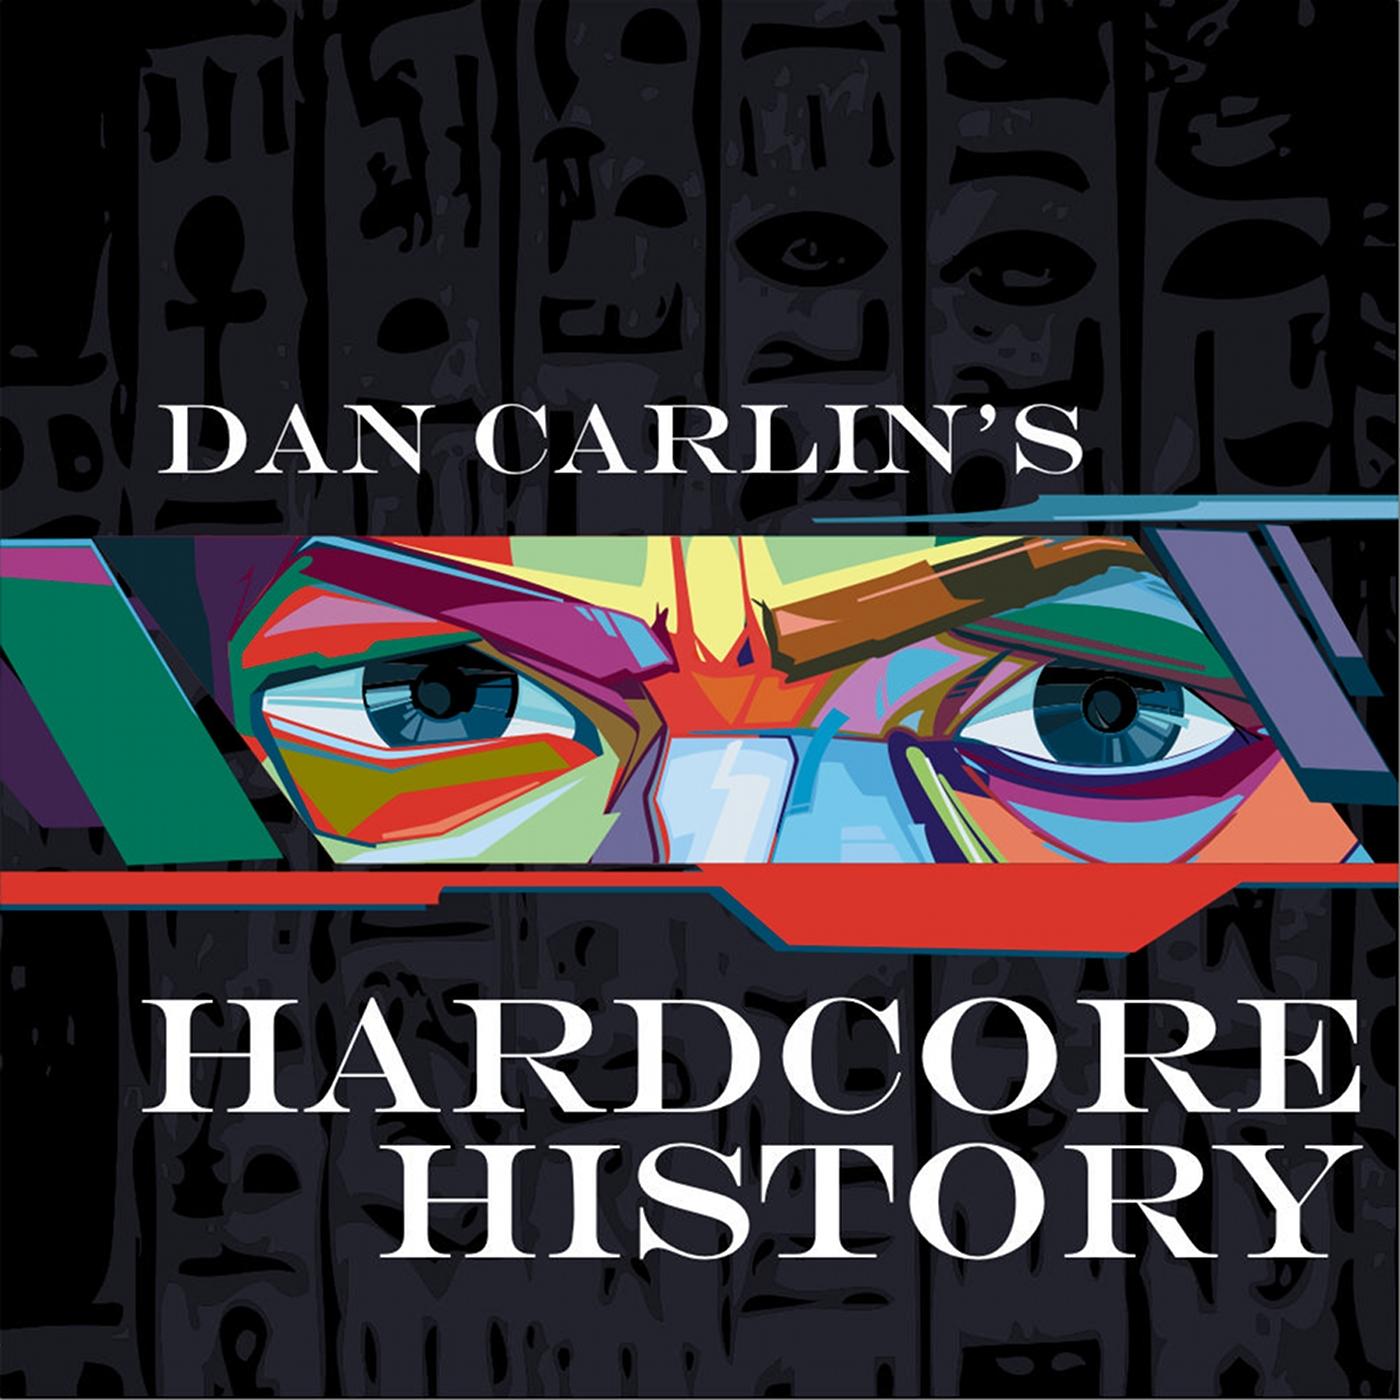 Dan Carlin's Hardcore History show image